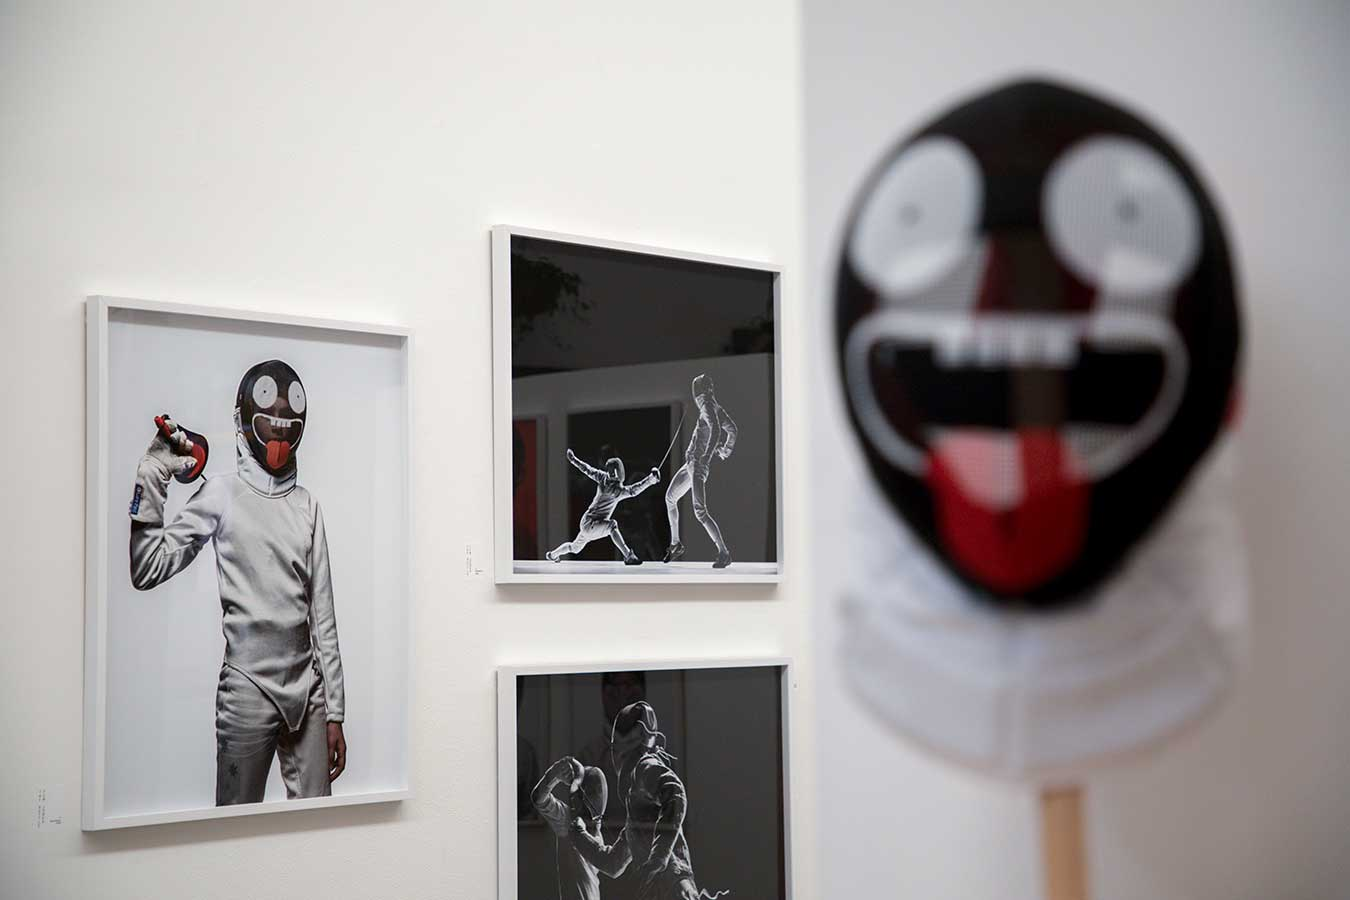 installation-image-from -photographer-tim-jones-exhibition-the-battle